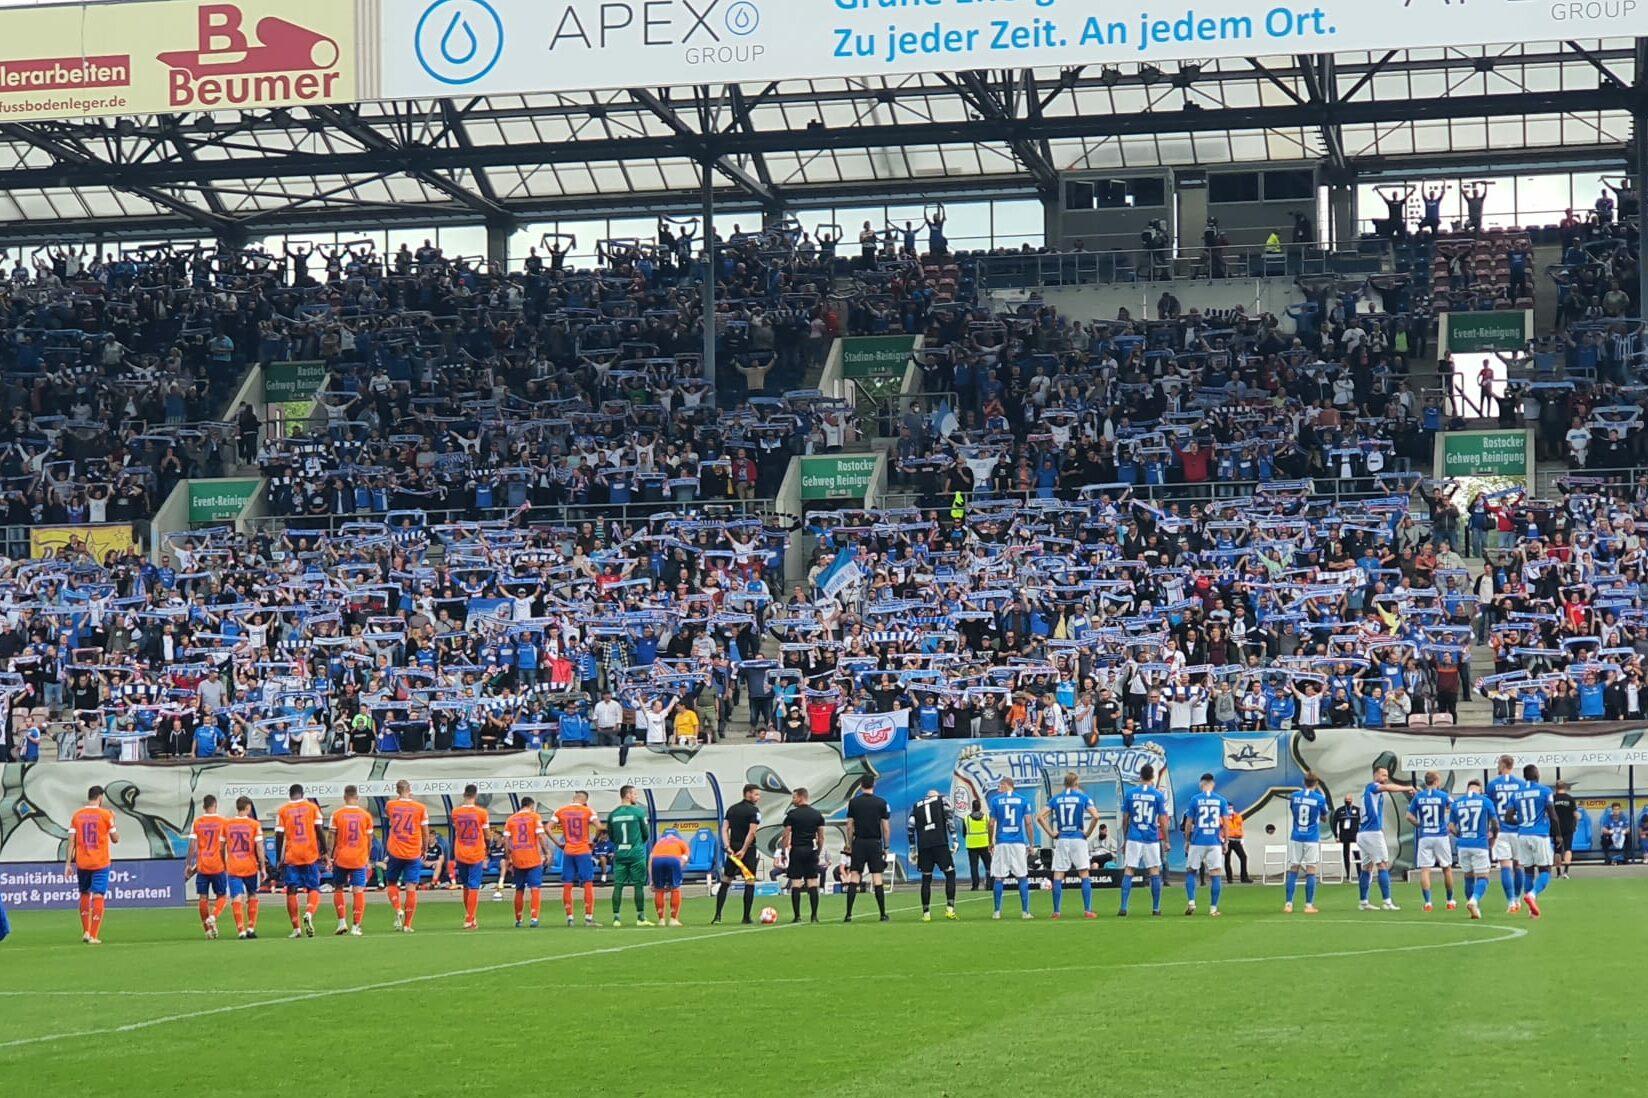 Hansa Rostock – SV Darmstadt 98 2:1 (1:0)